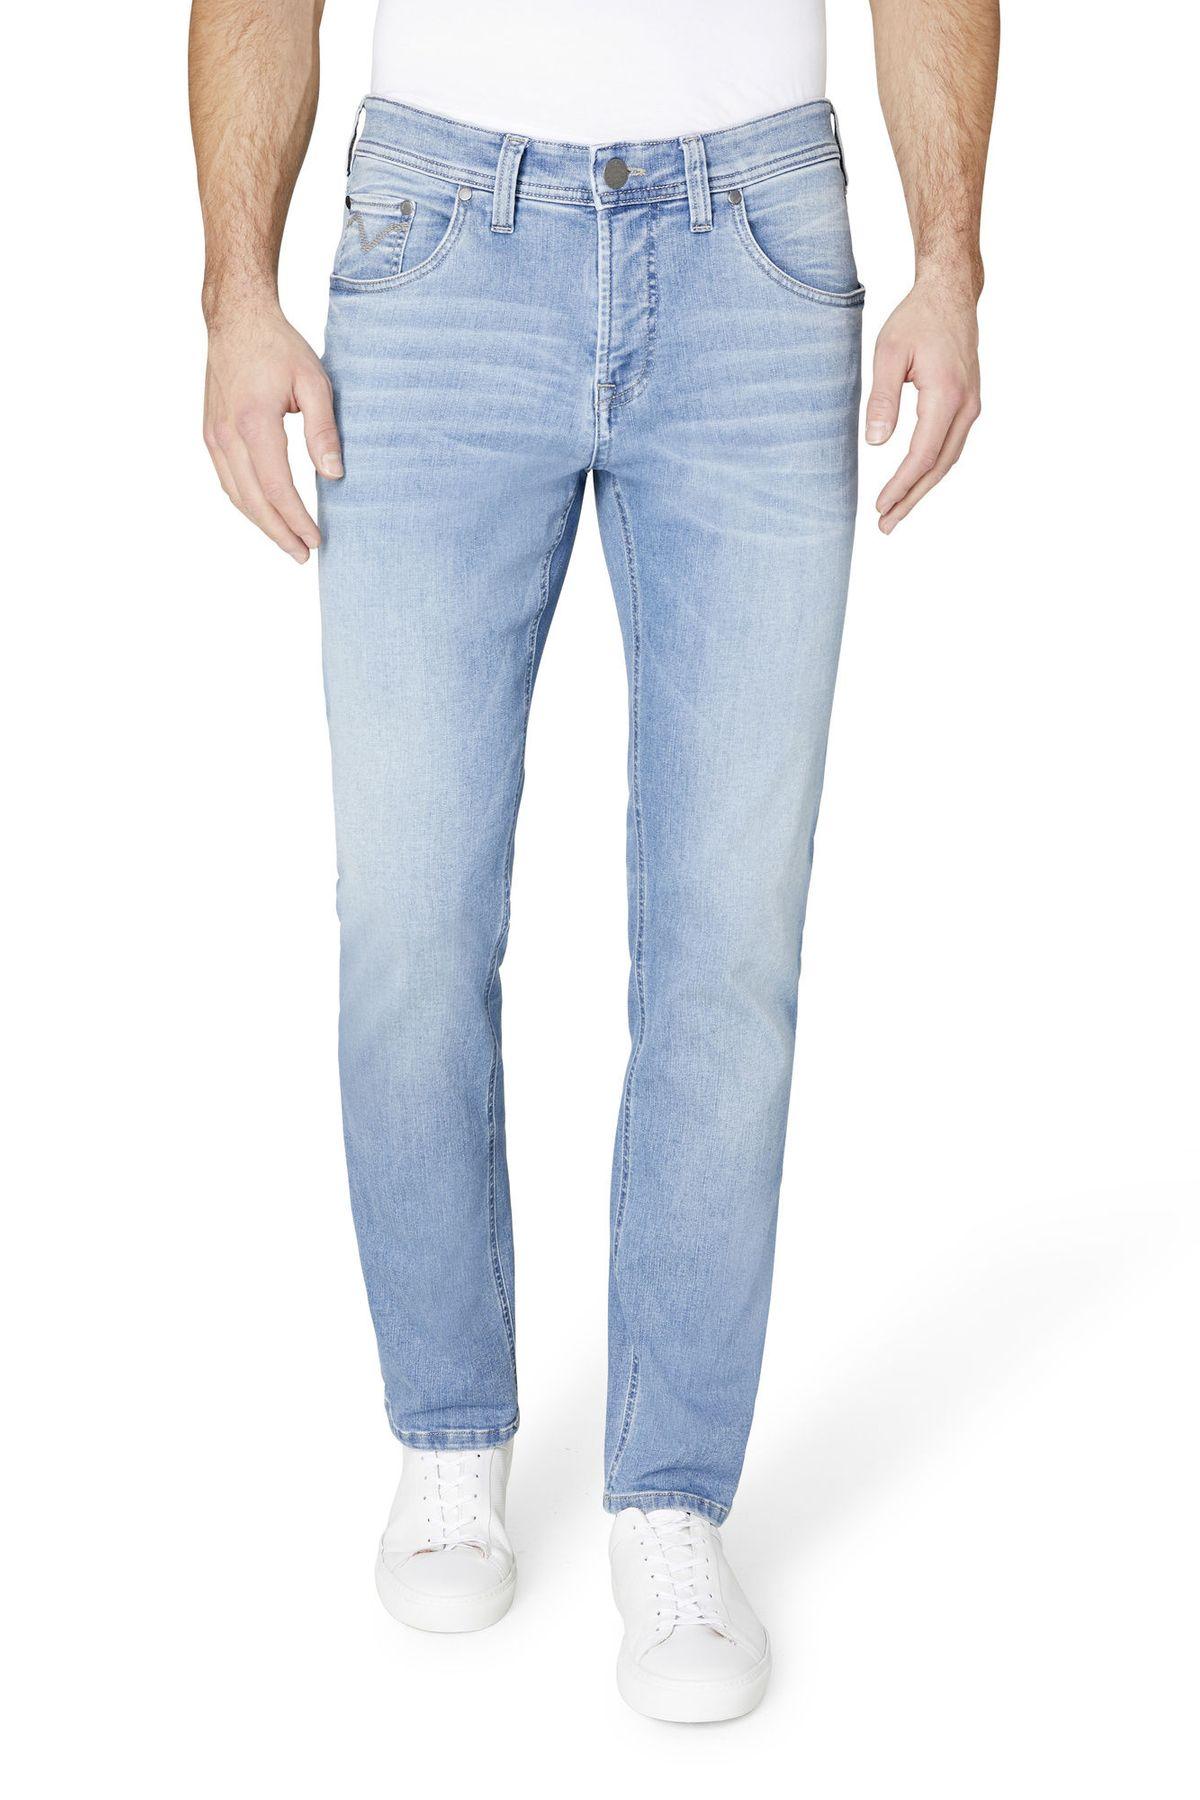 Atelier Gardeur - Modern Fit - Herren 5-Pocket Jeans, Denimstretch, Bill-8 (470391) – Bild 1